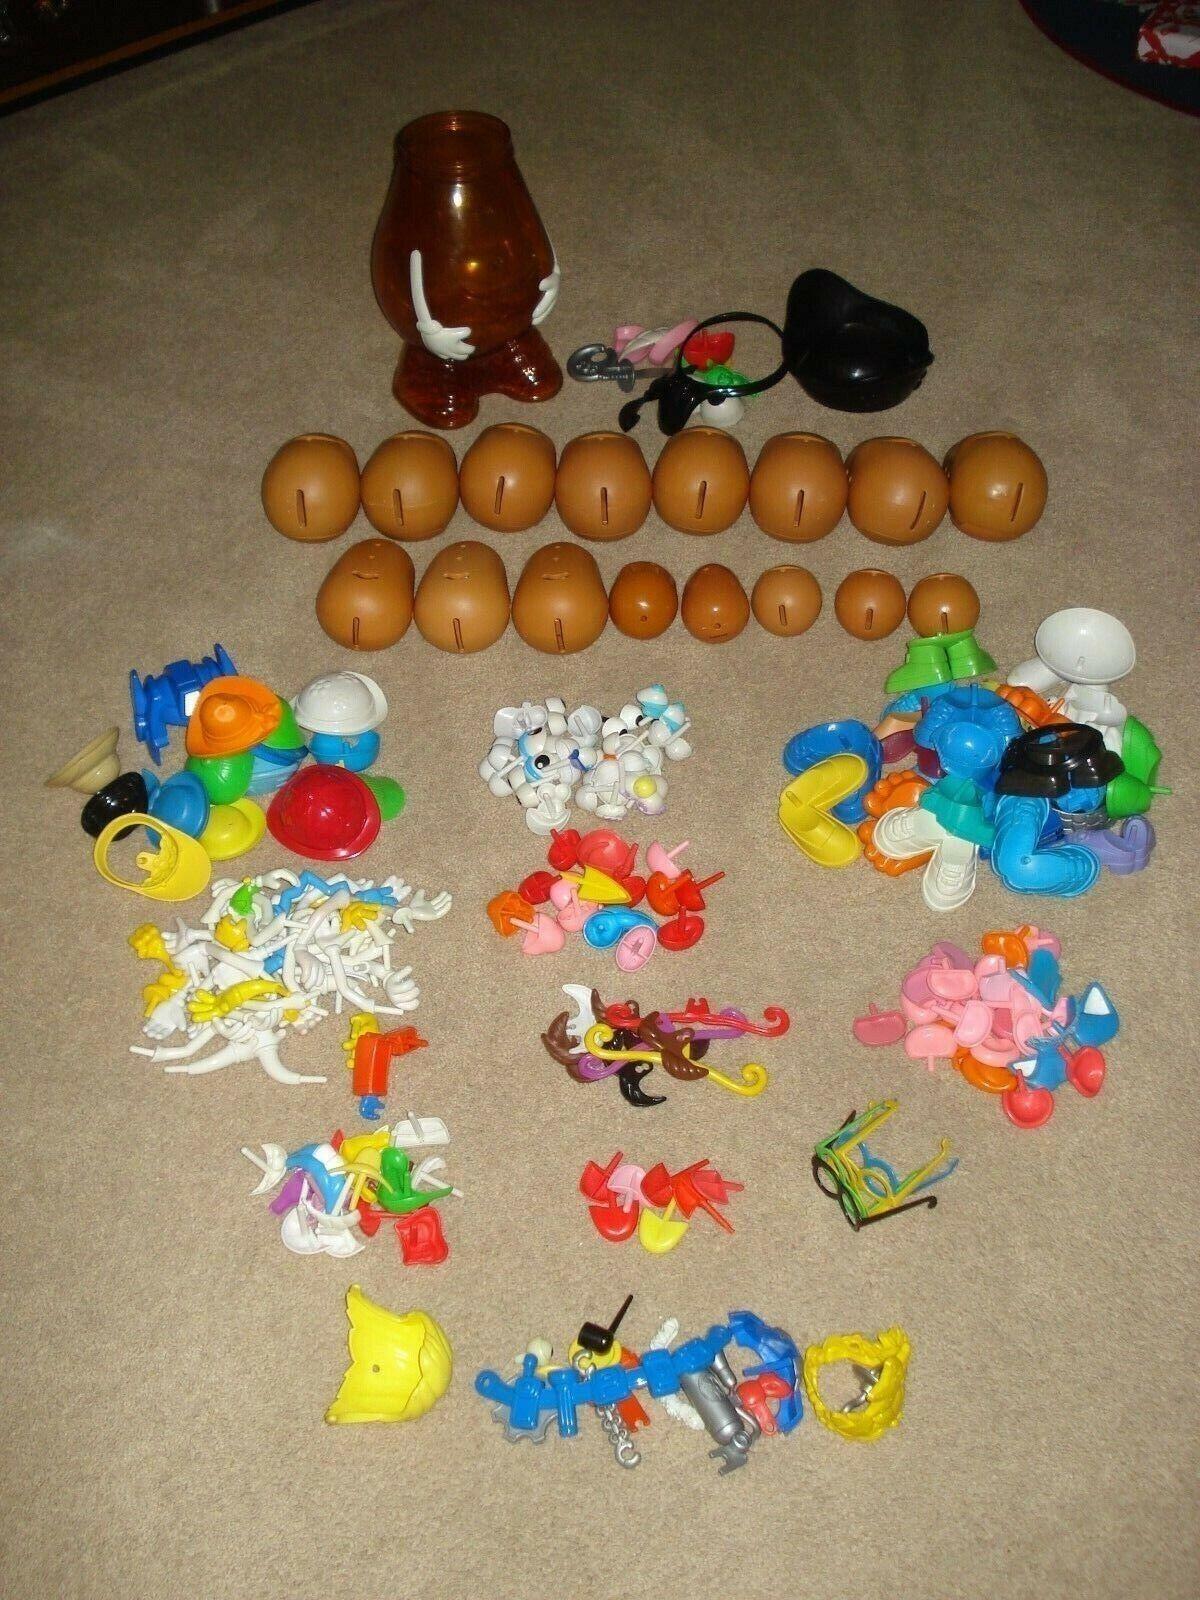 Mr. Potato Head Lot-17 Assorted Assorted Assorted Potatoes & 196 Pieces 2abdac